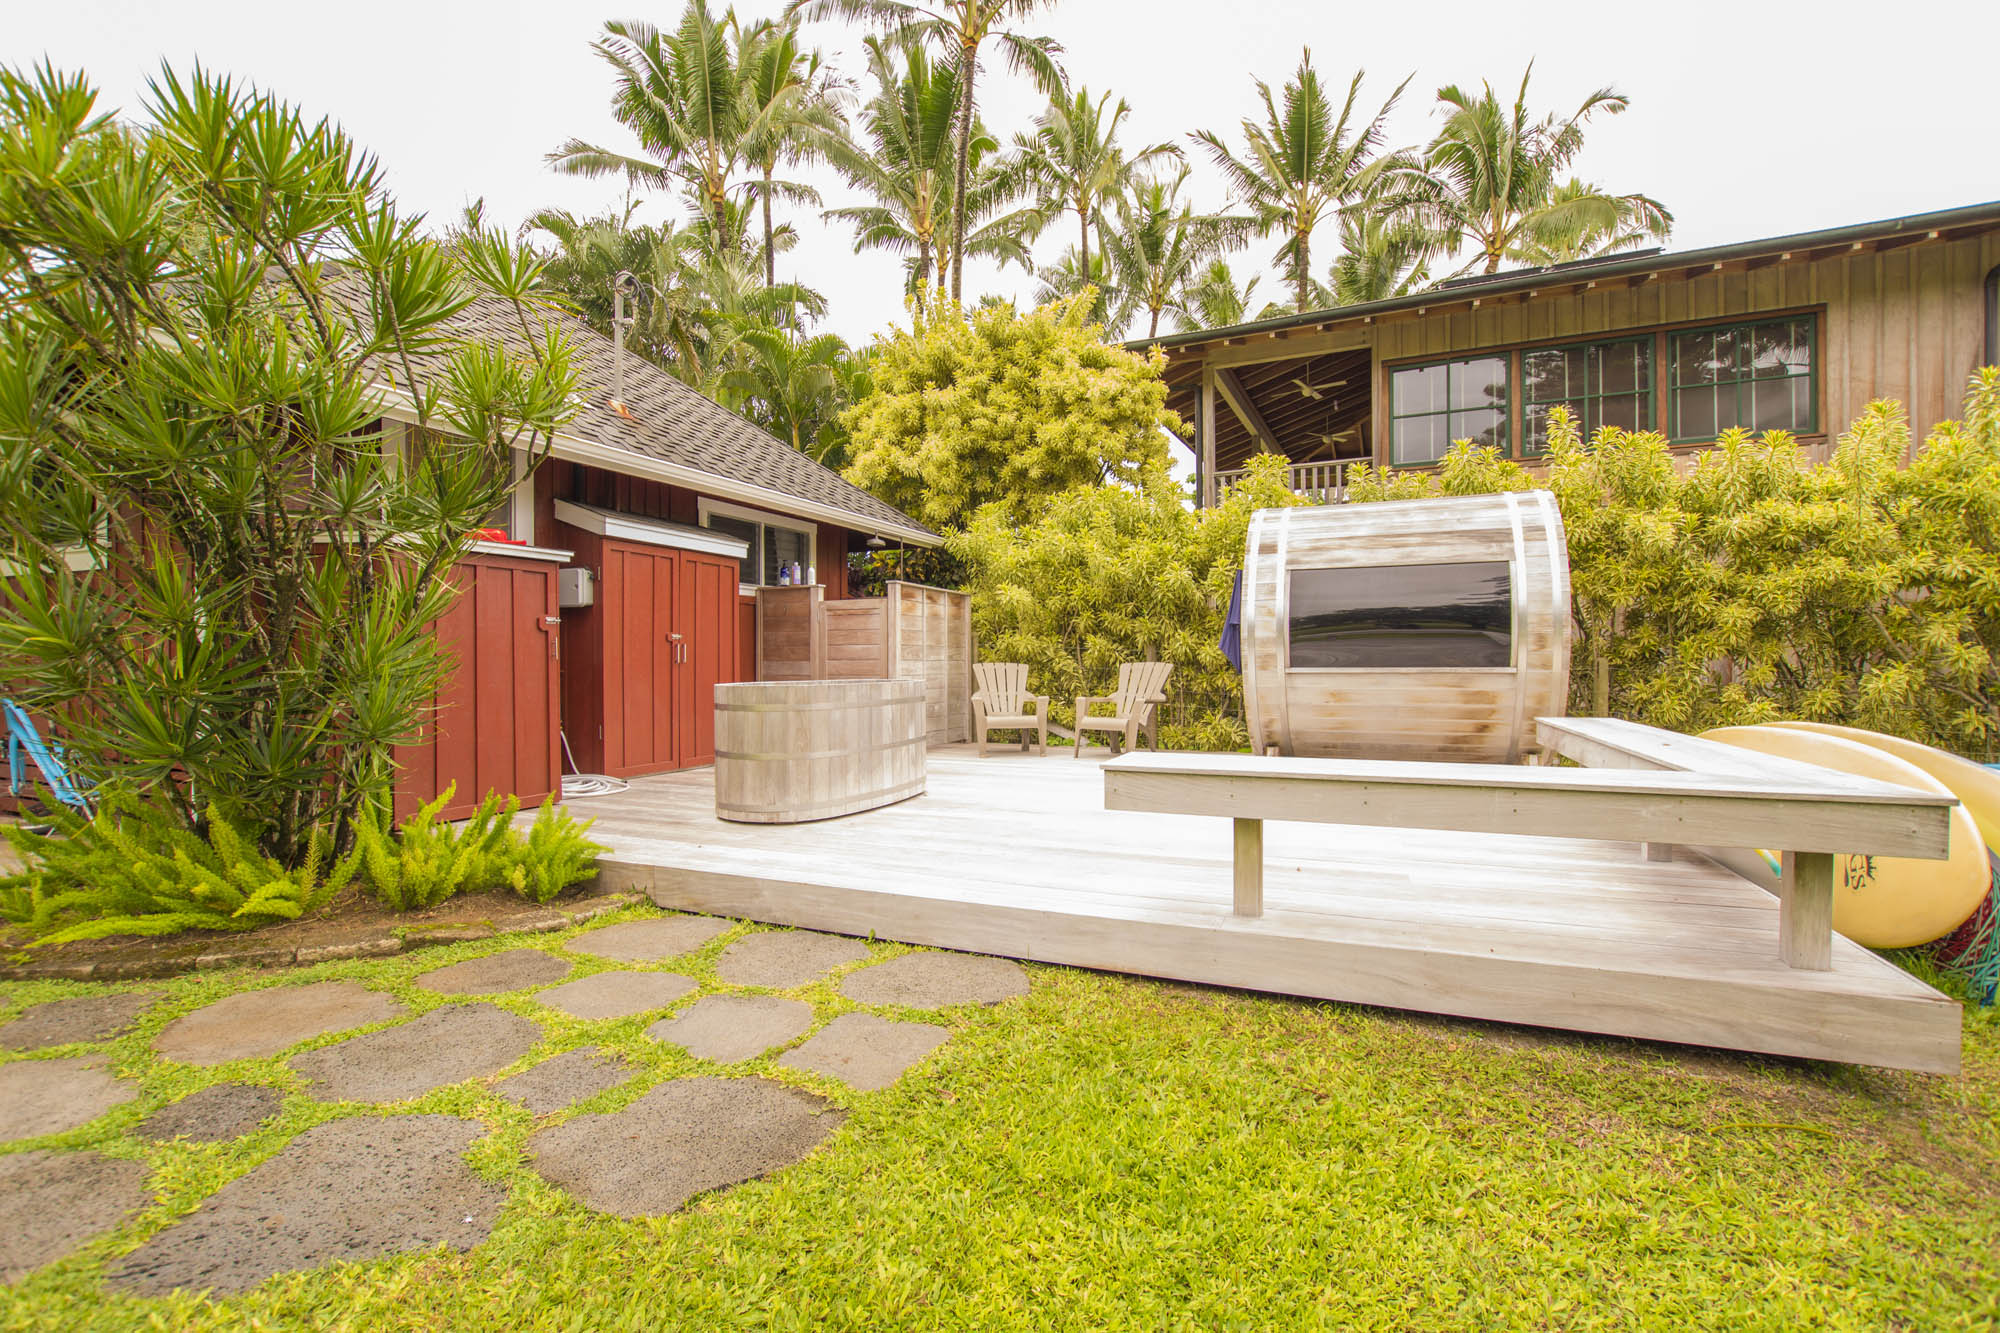 Kauai-217-Hanalei Bay50